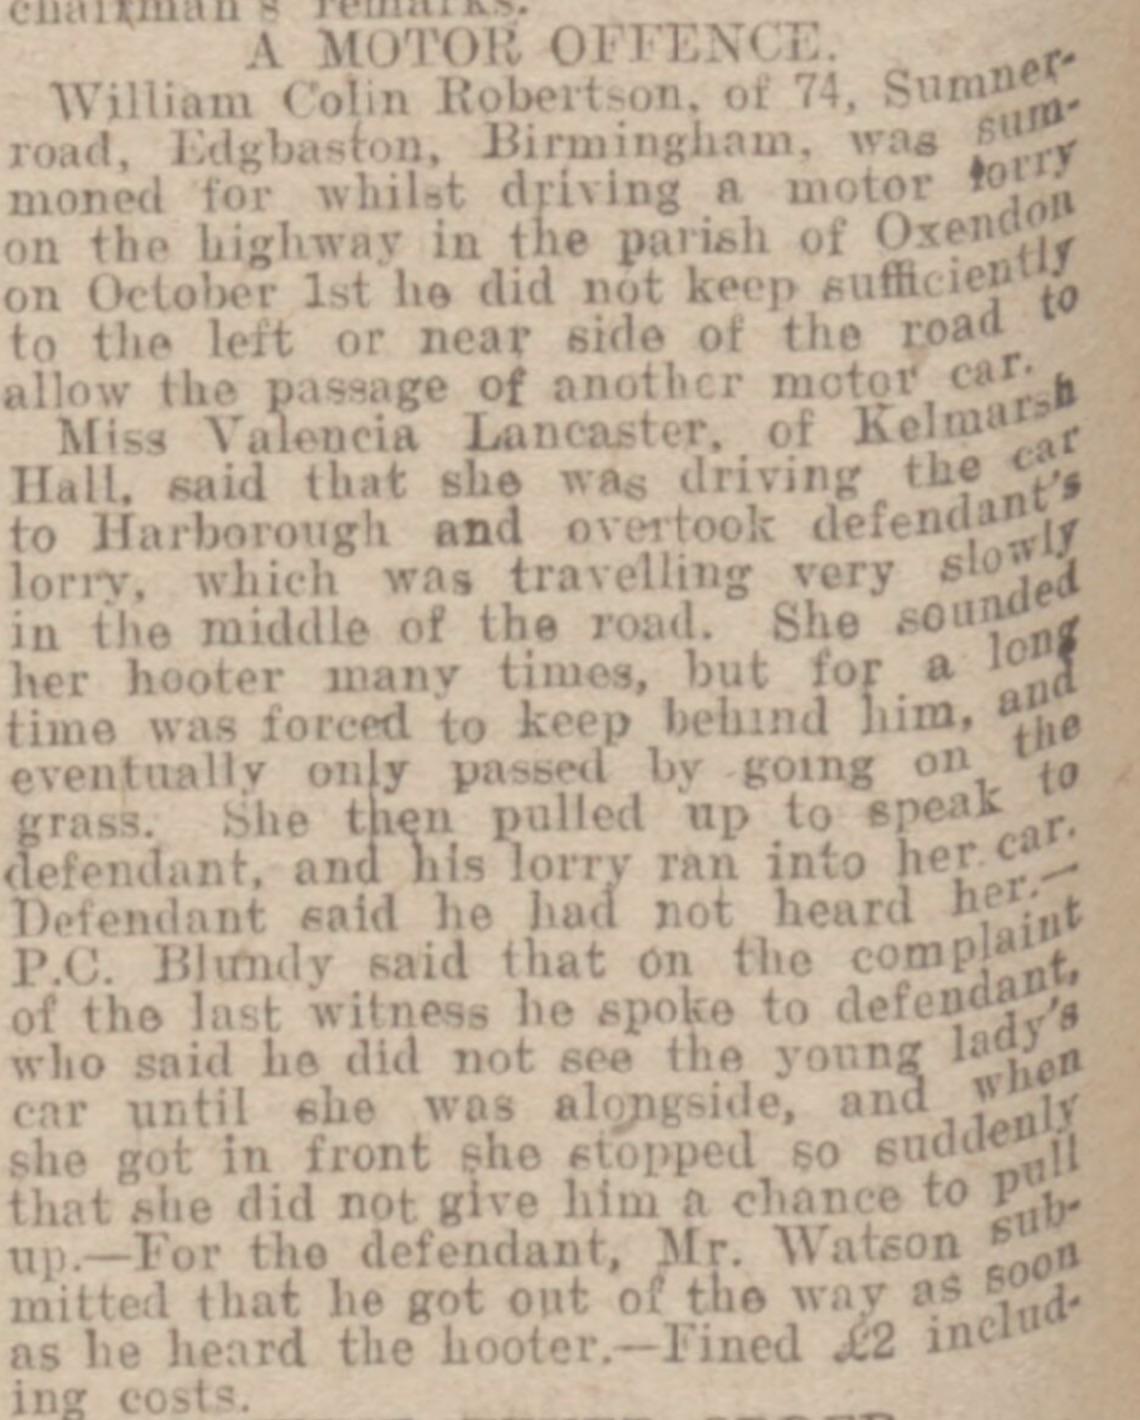 Northampton Mercury November 11, 1921 page 6